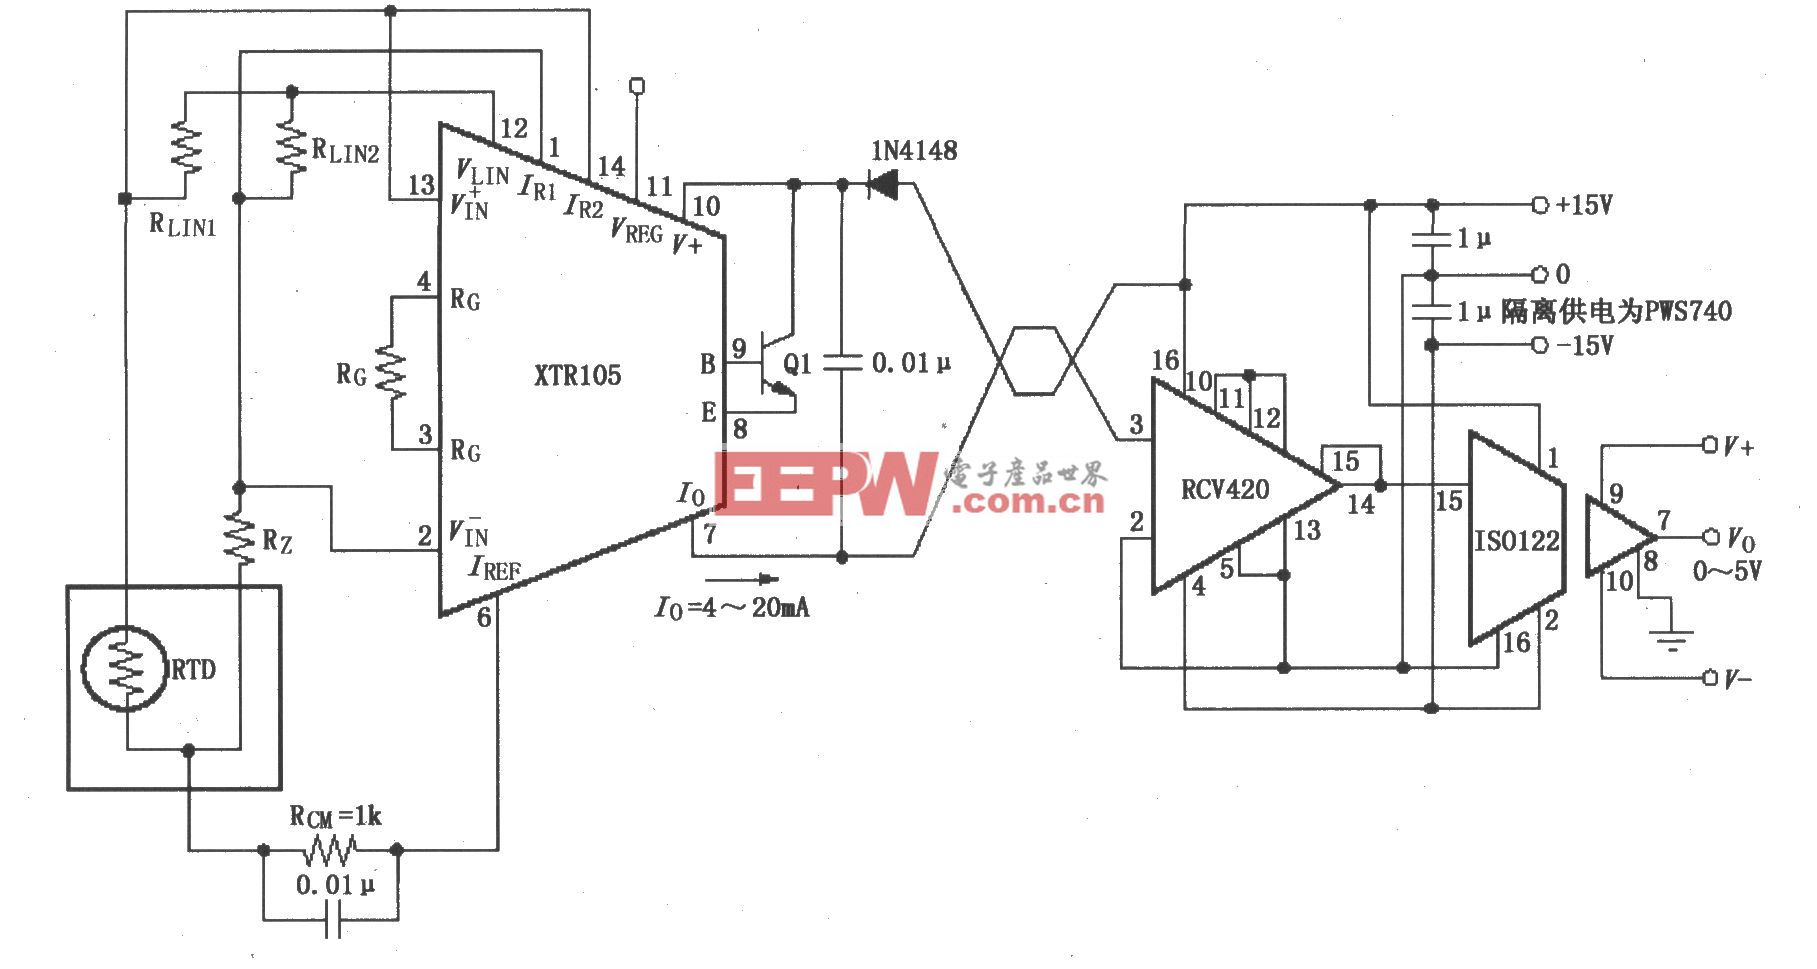 RCV420隔离式4~20mA仪表环路(RTD)